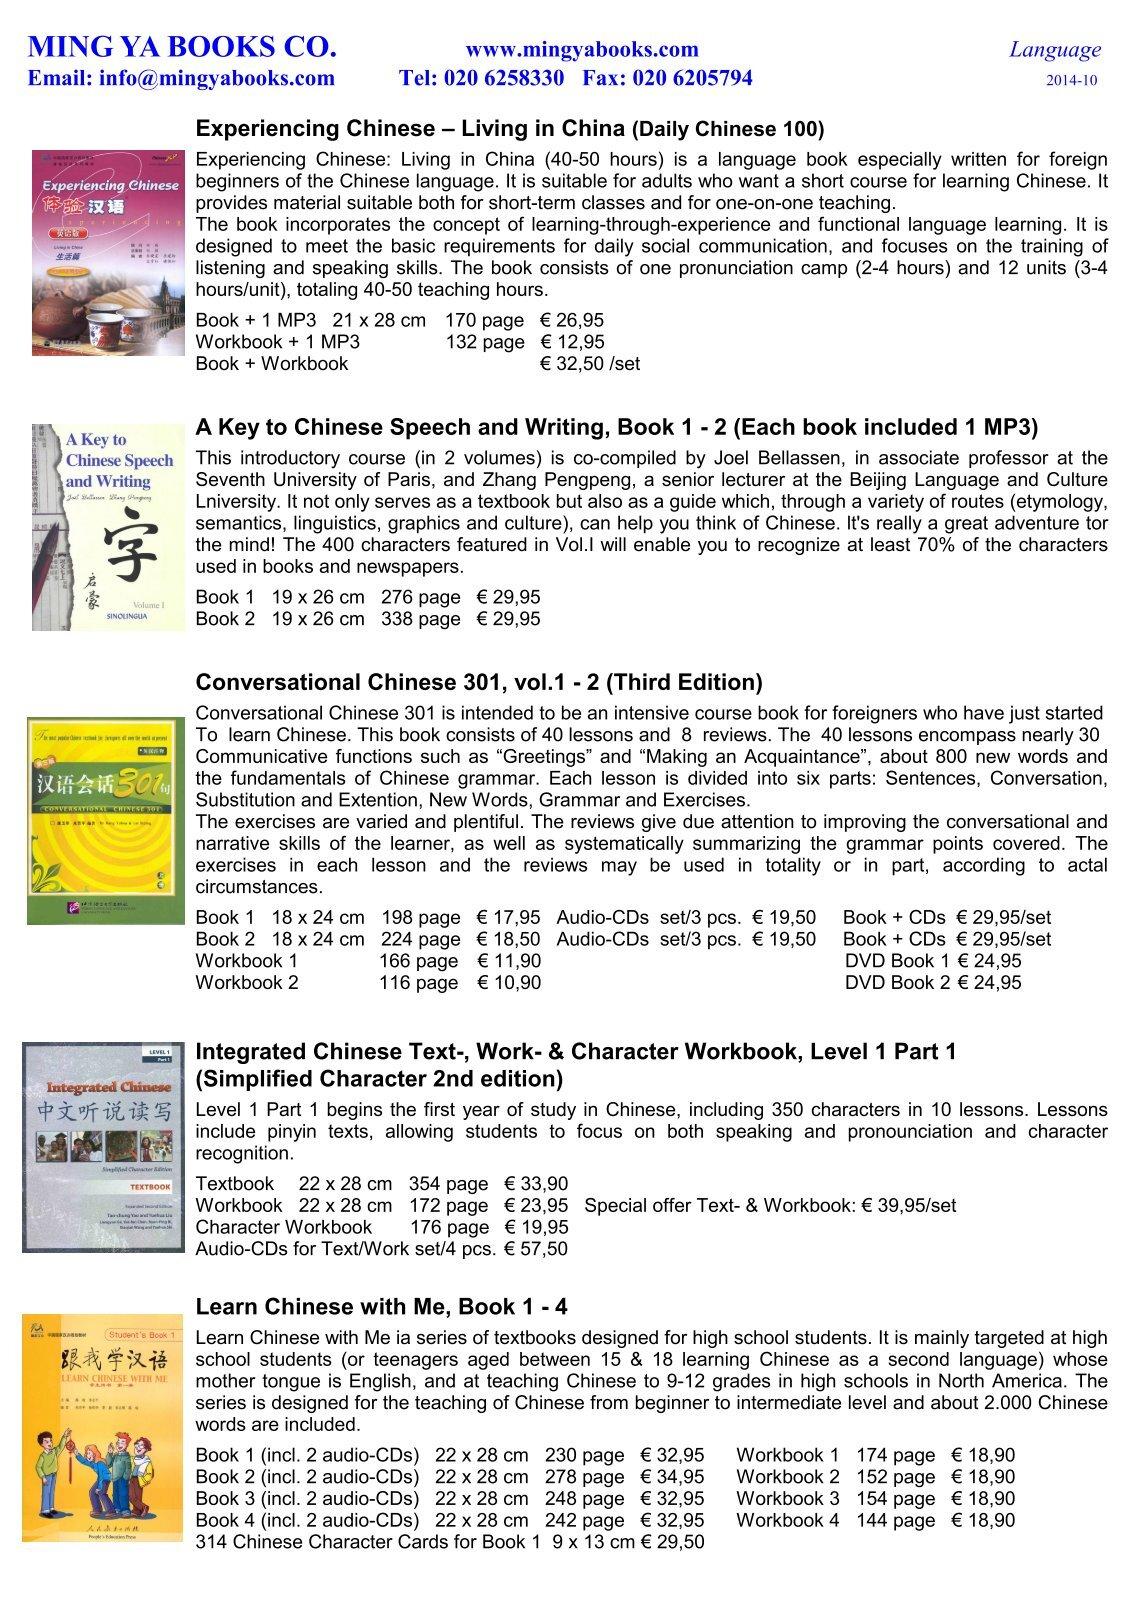 Workbooks integrated chinese workbook level 1 part 2 : 20 free Magazines from MINGYABOOKS.COM